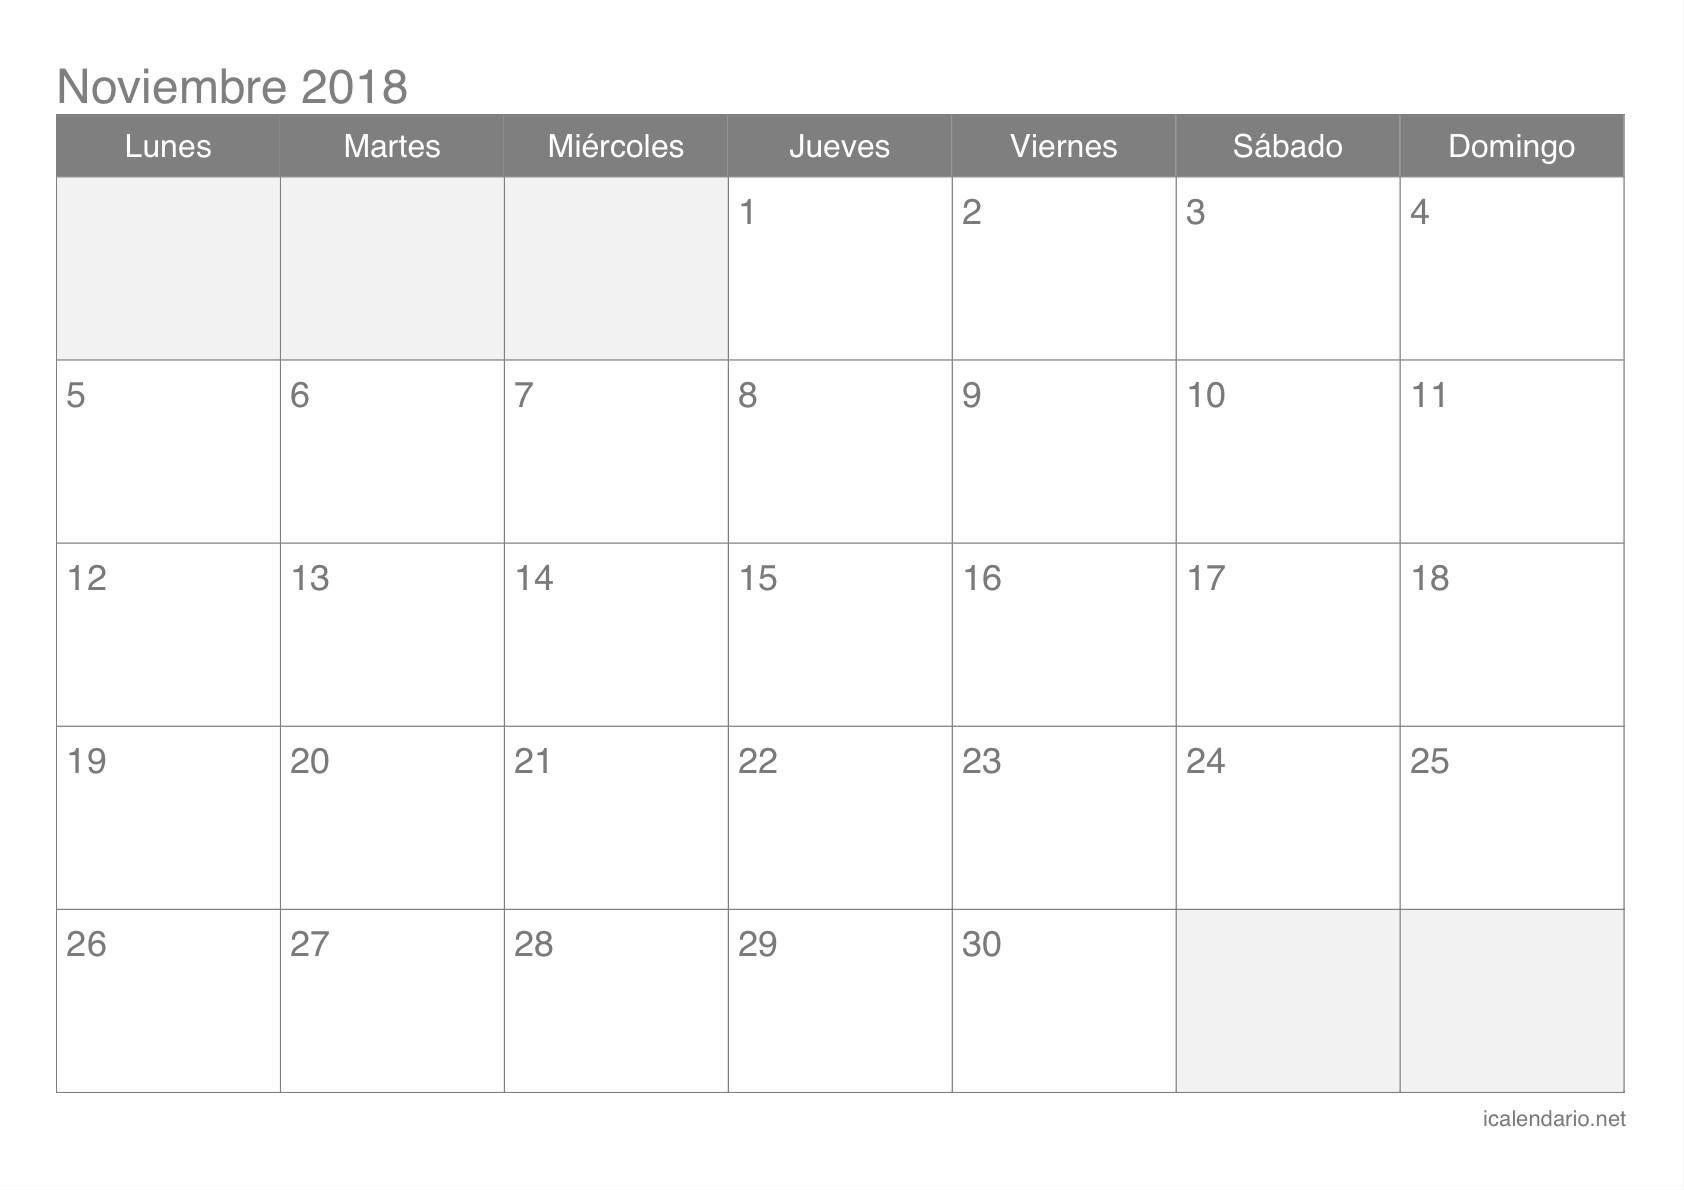 Calendario de noviembre 2018 Calendario de noviembre 2018